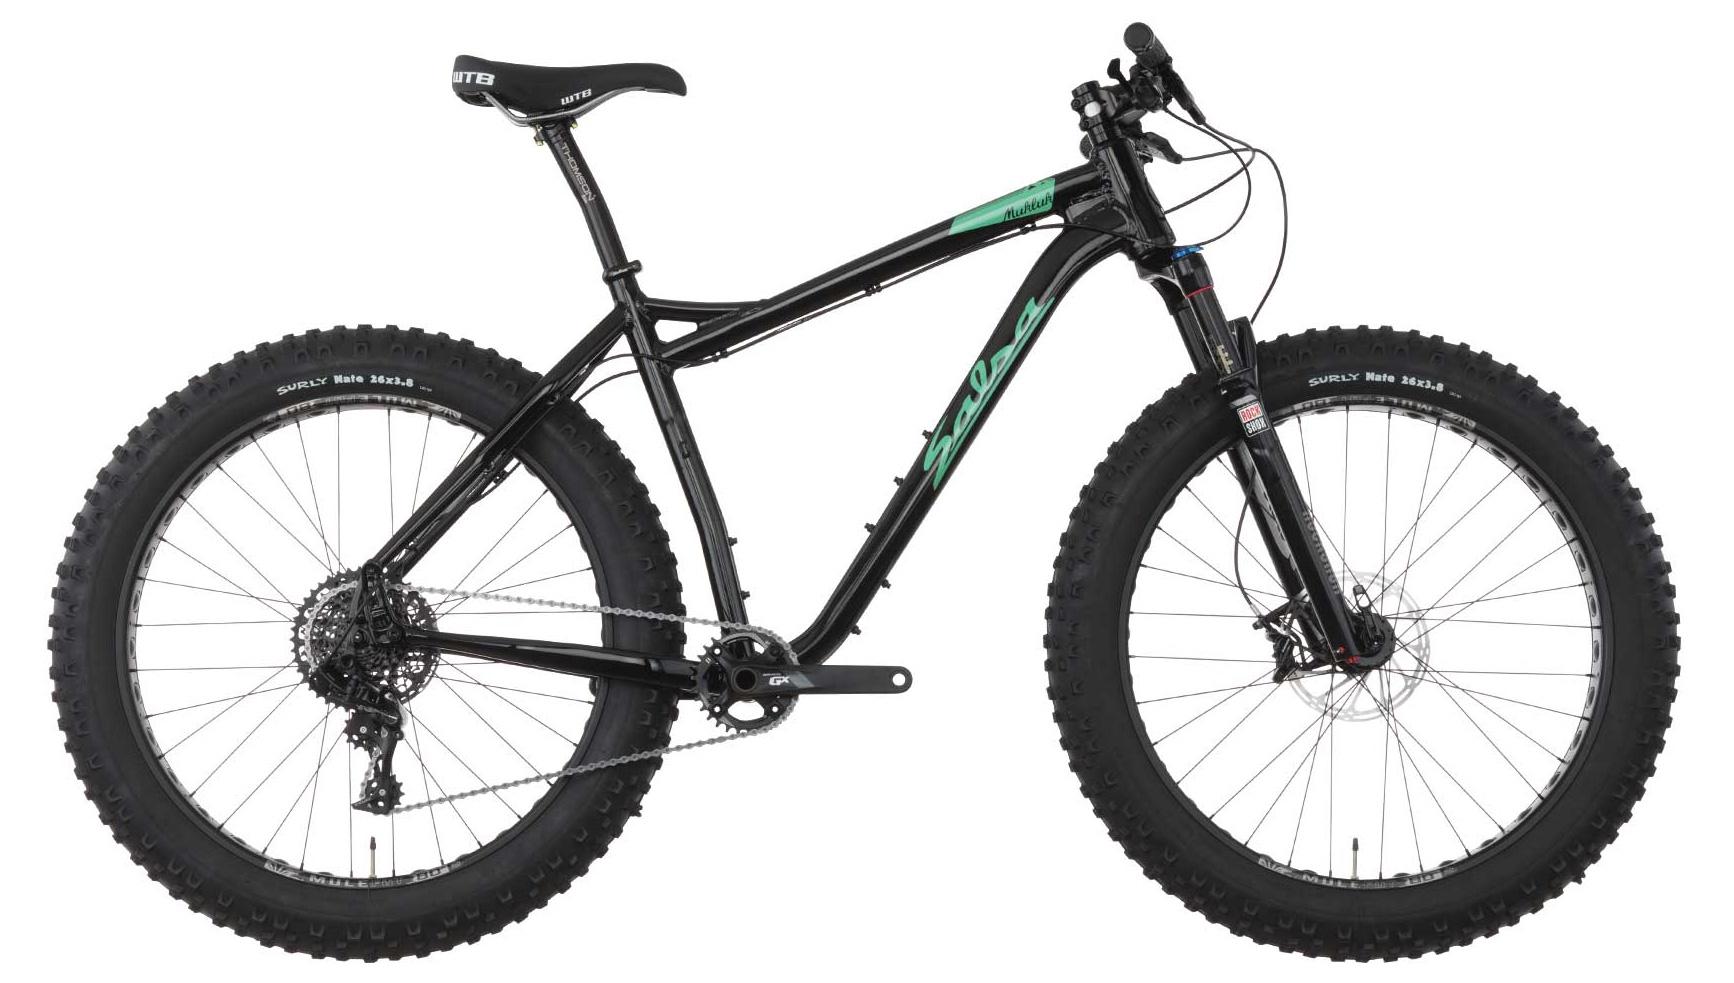 black salsa mukluk fat tire bike with front suspension fork